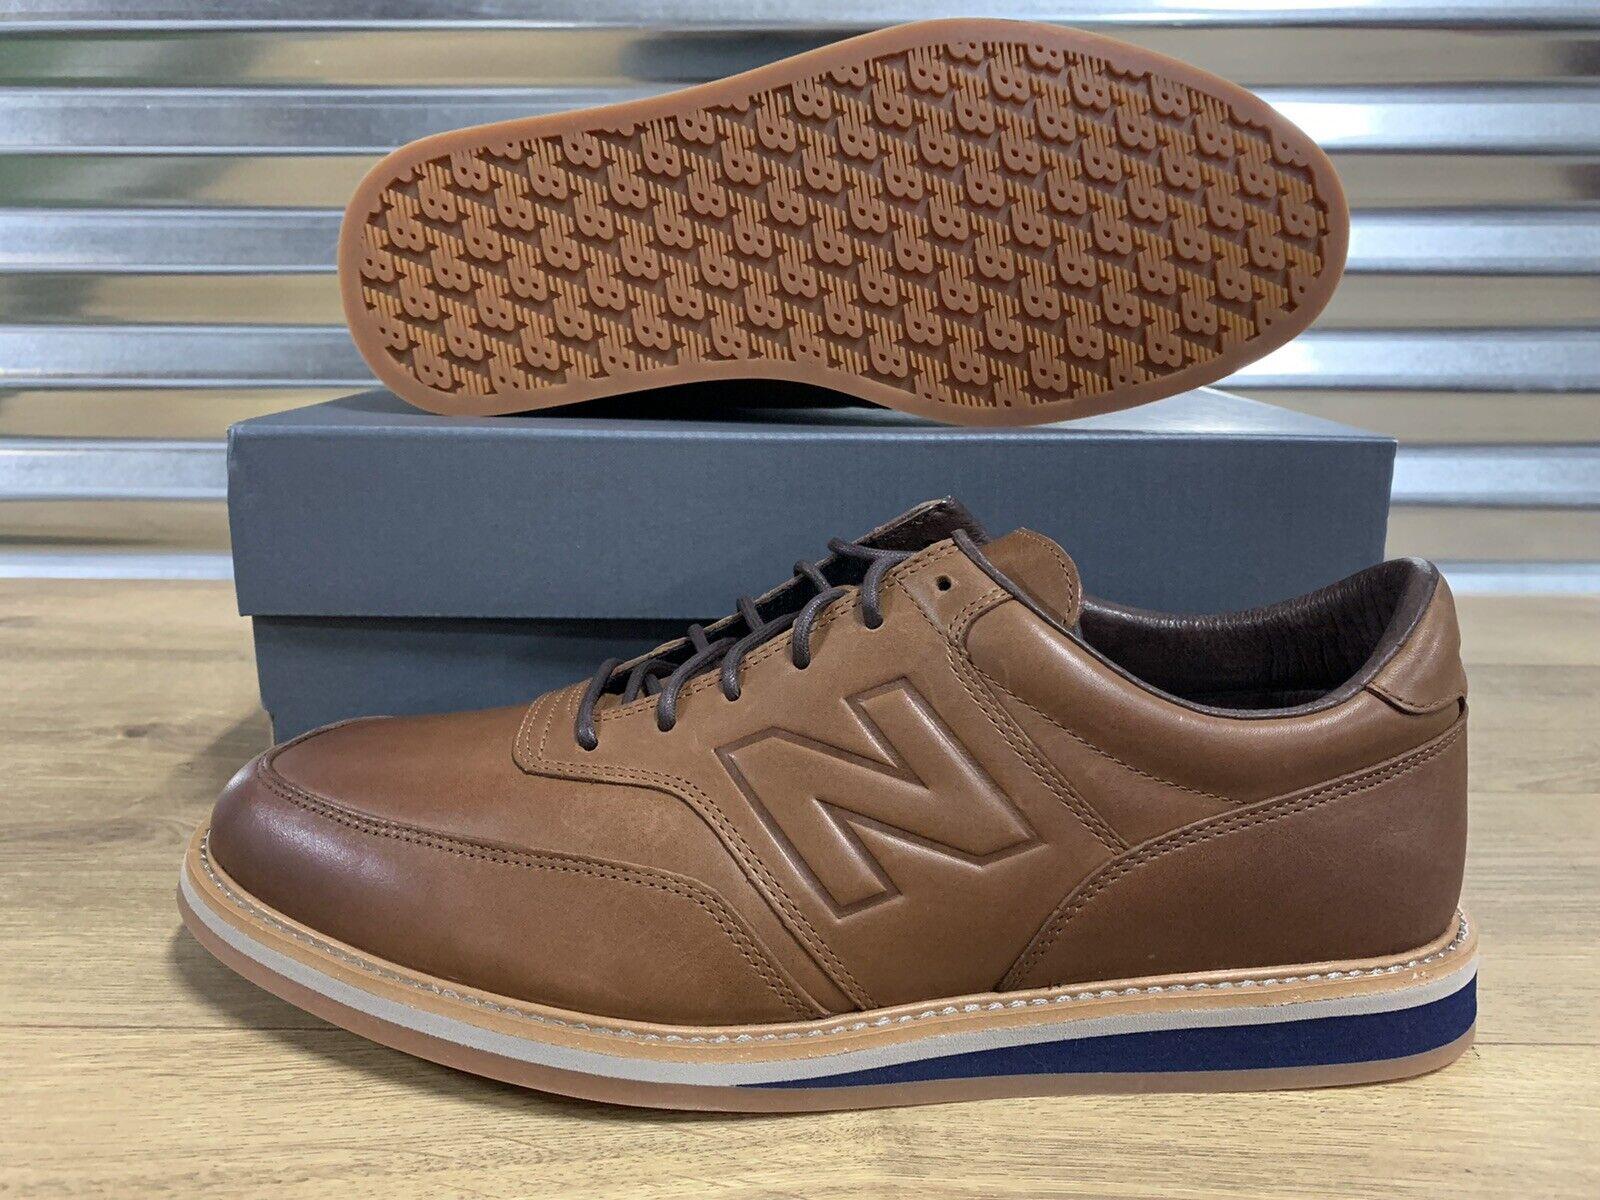 New Balance 1100 Leather Walking Shoes